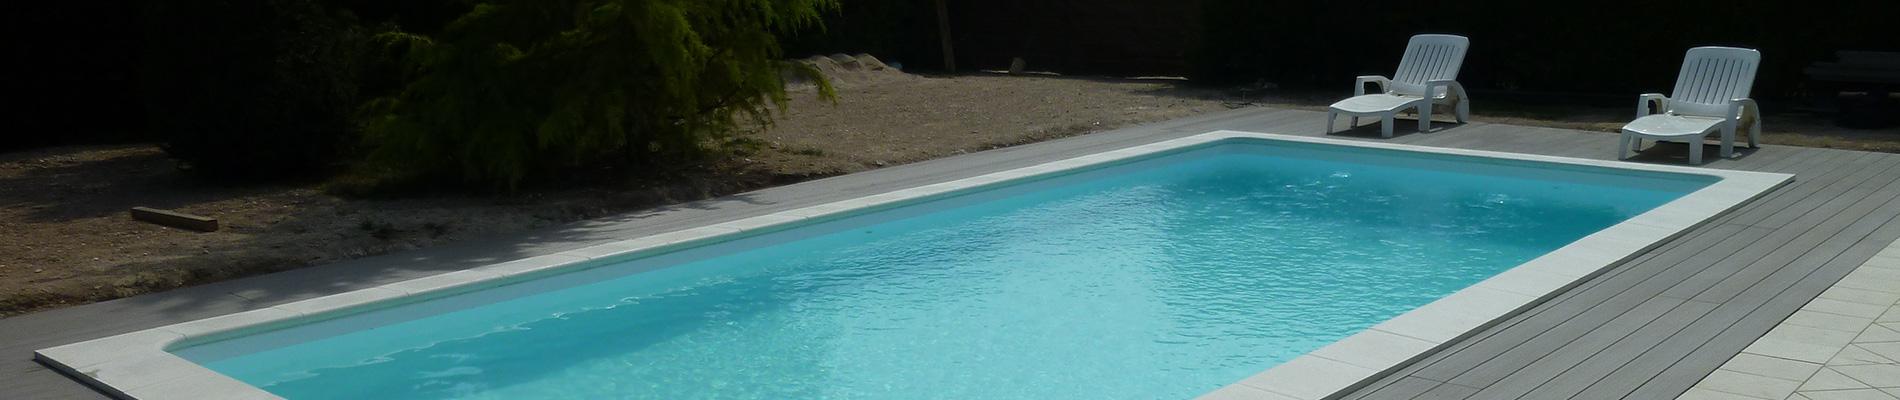 Nano The Small Pool Piscines Dugain Troyes